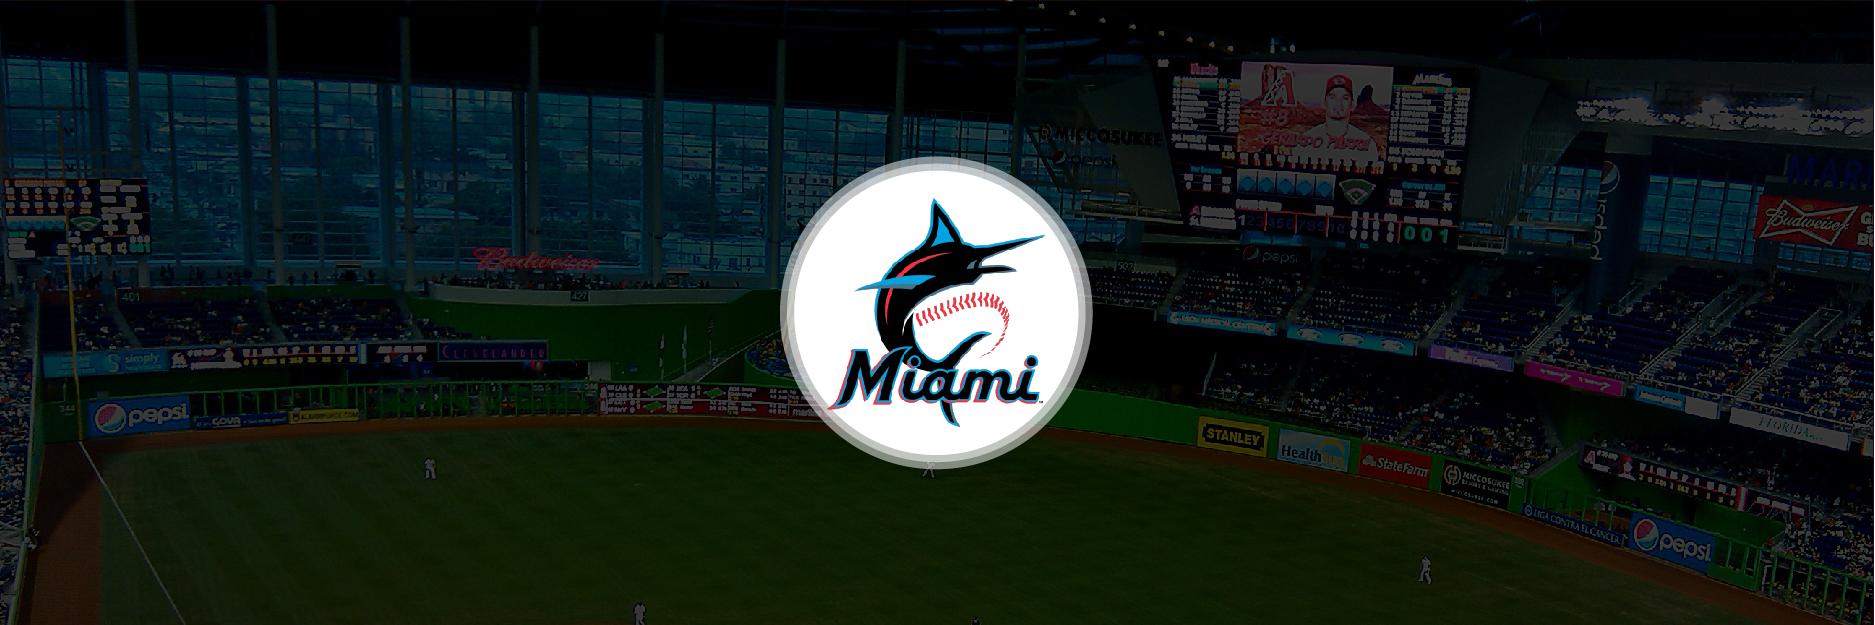 Miami Marlins 2020 Pre-Season Analysis